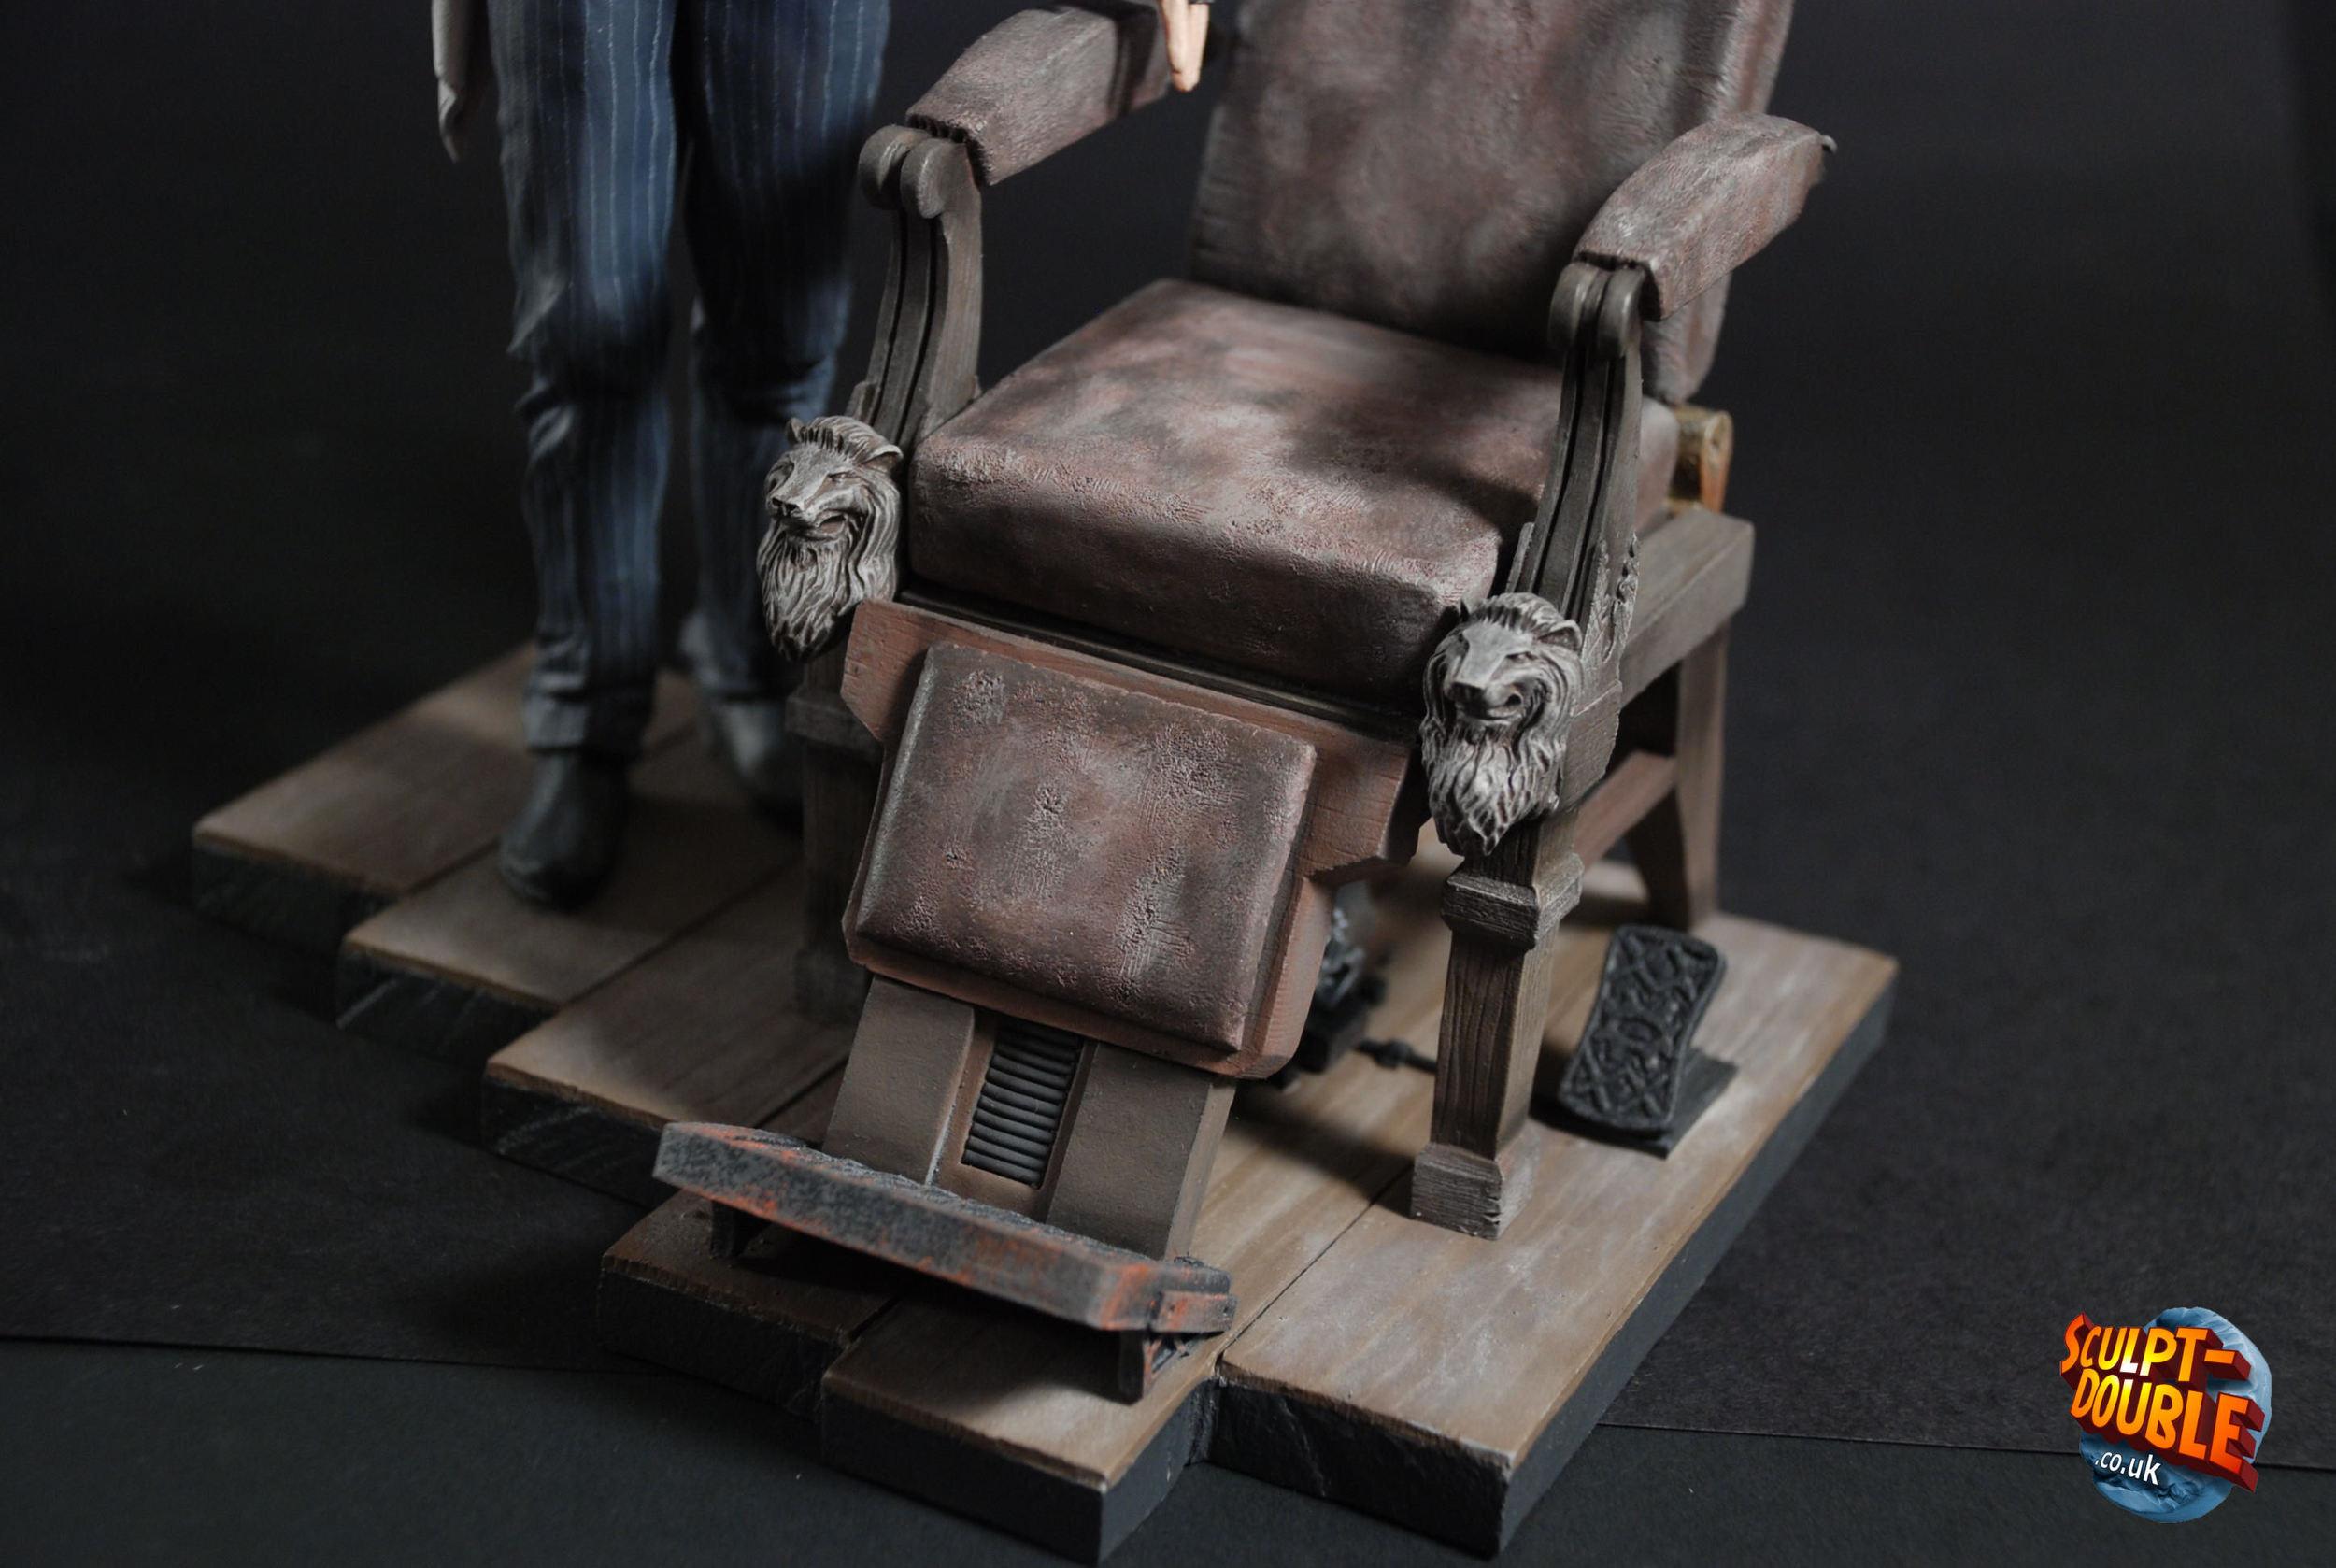 Sweeney Todd chair 04.jpg